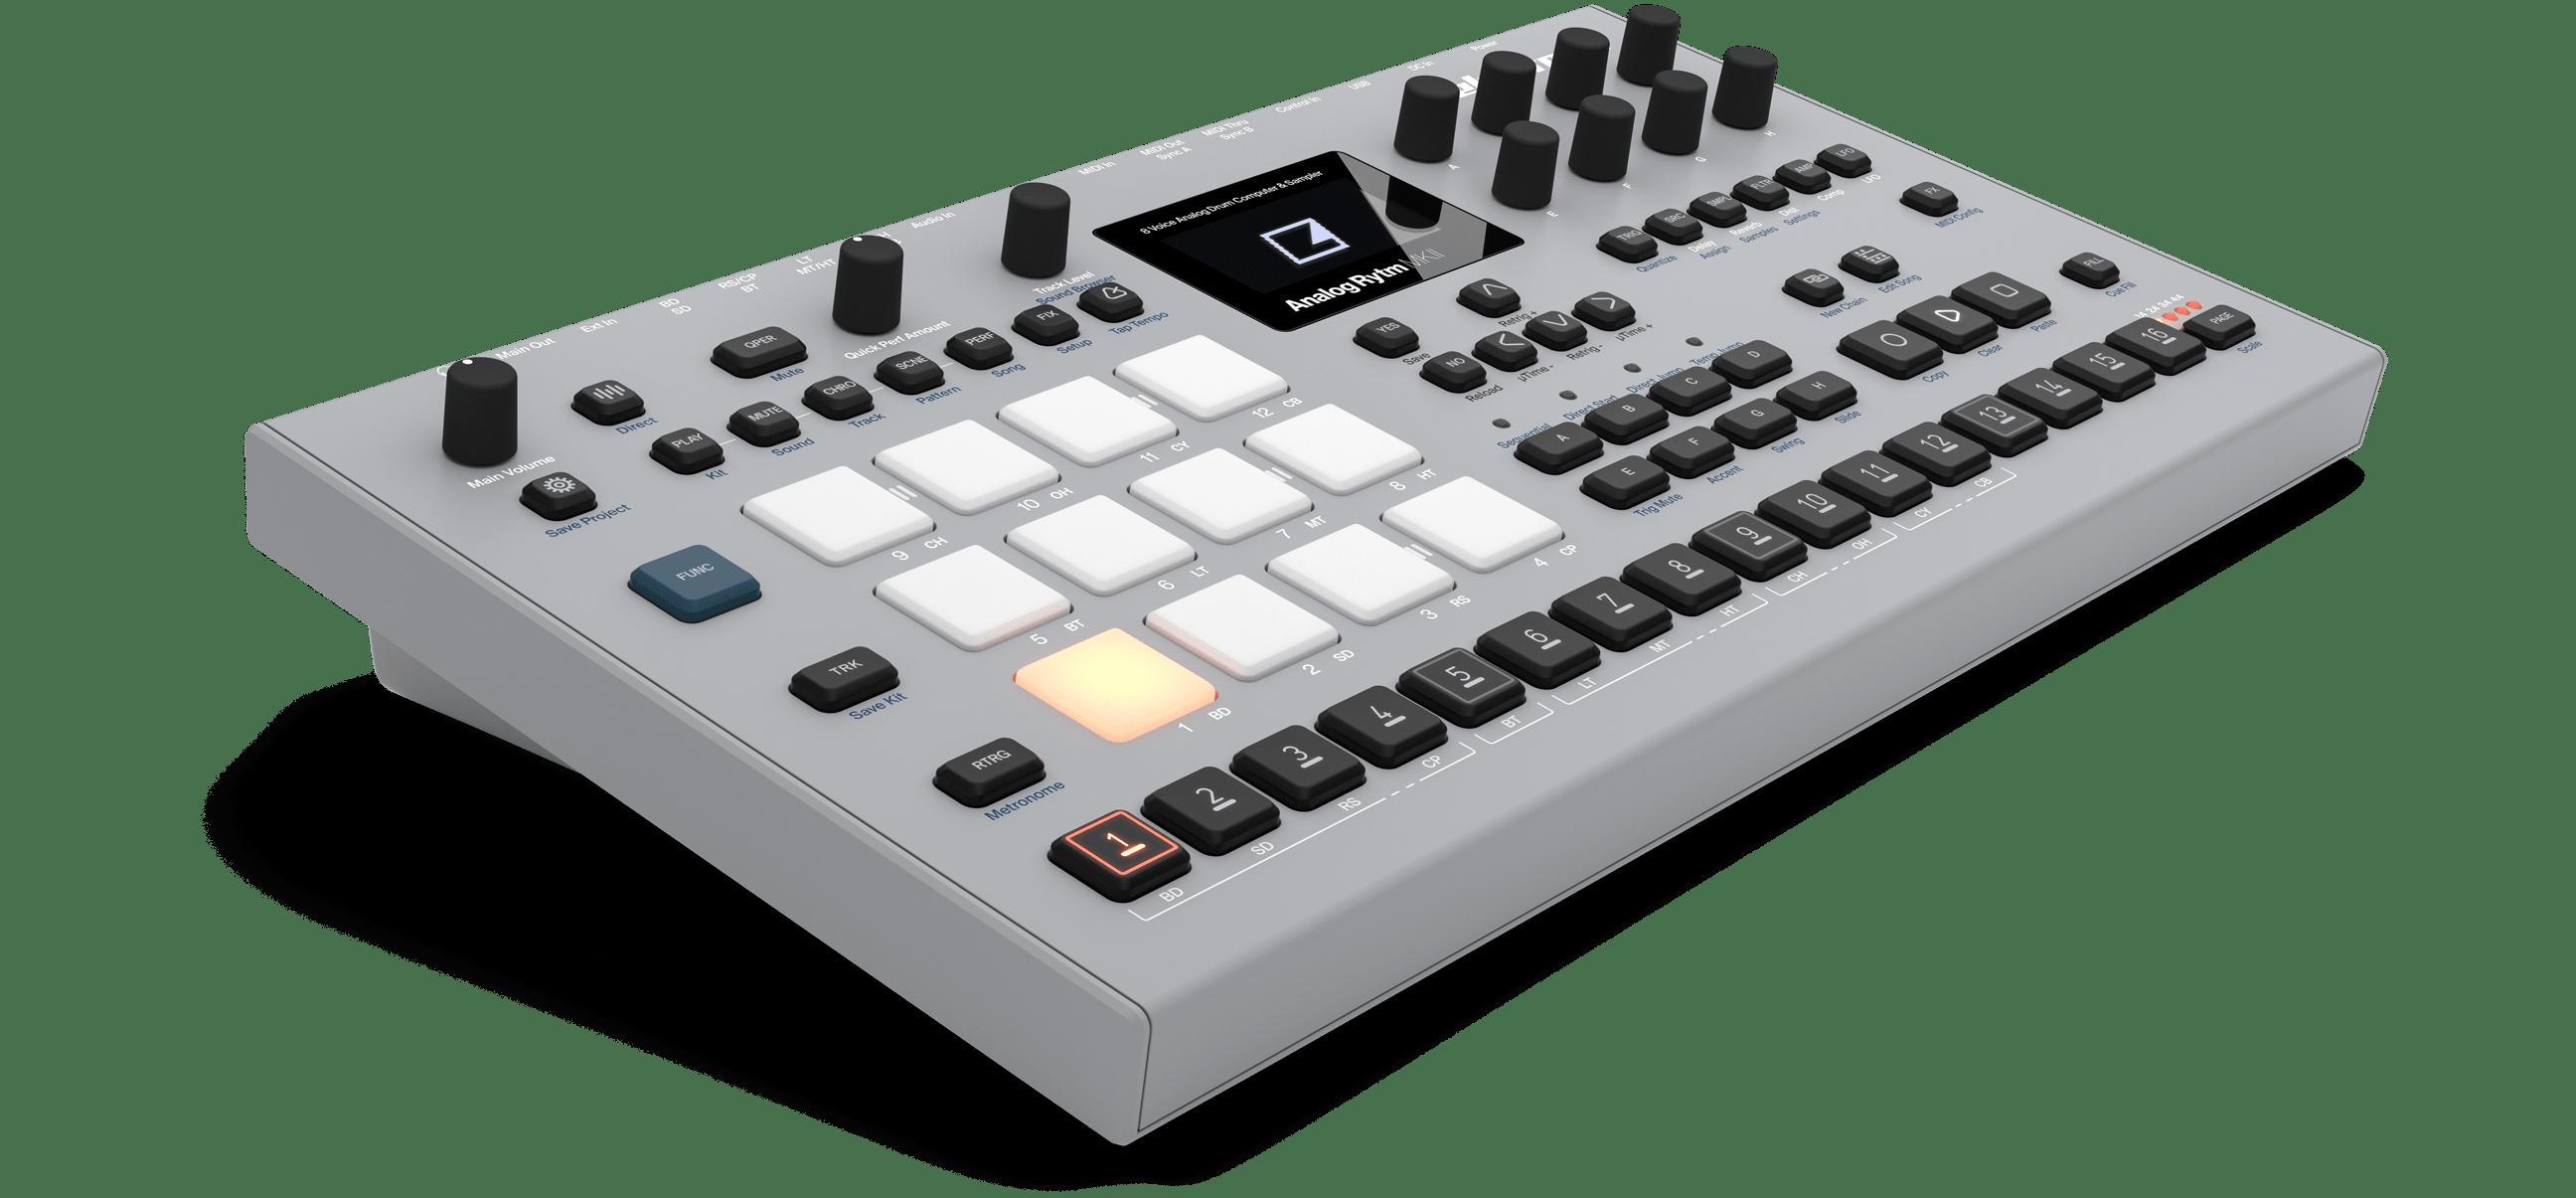 analog rytm mkii elektron musica in 2019 music music machine music software. Black Bedroom Furniture Sets. Home Design Ideas